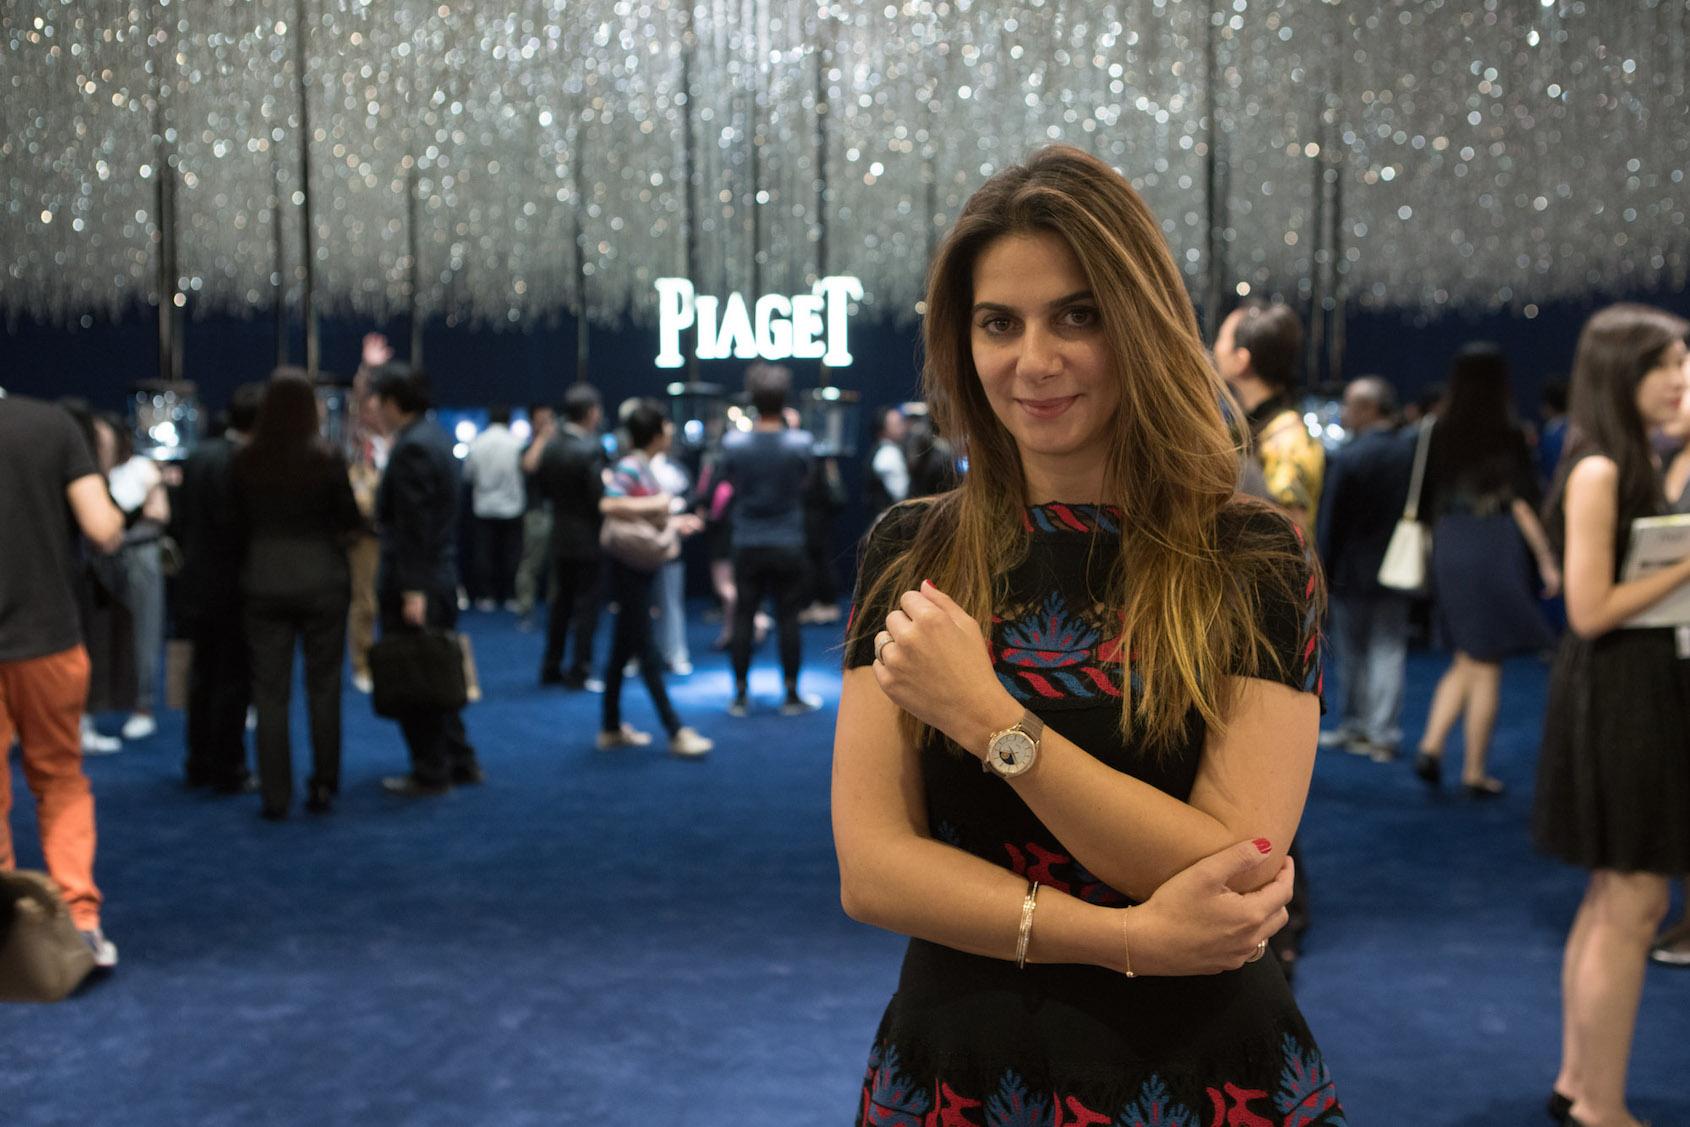 Piaget-watches-wonders-video